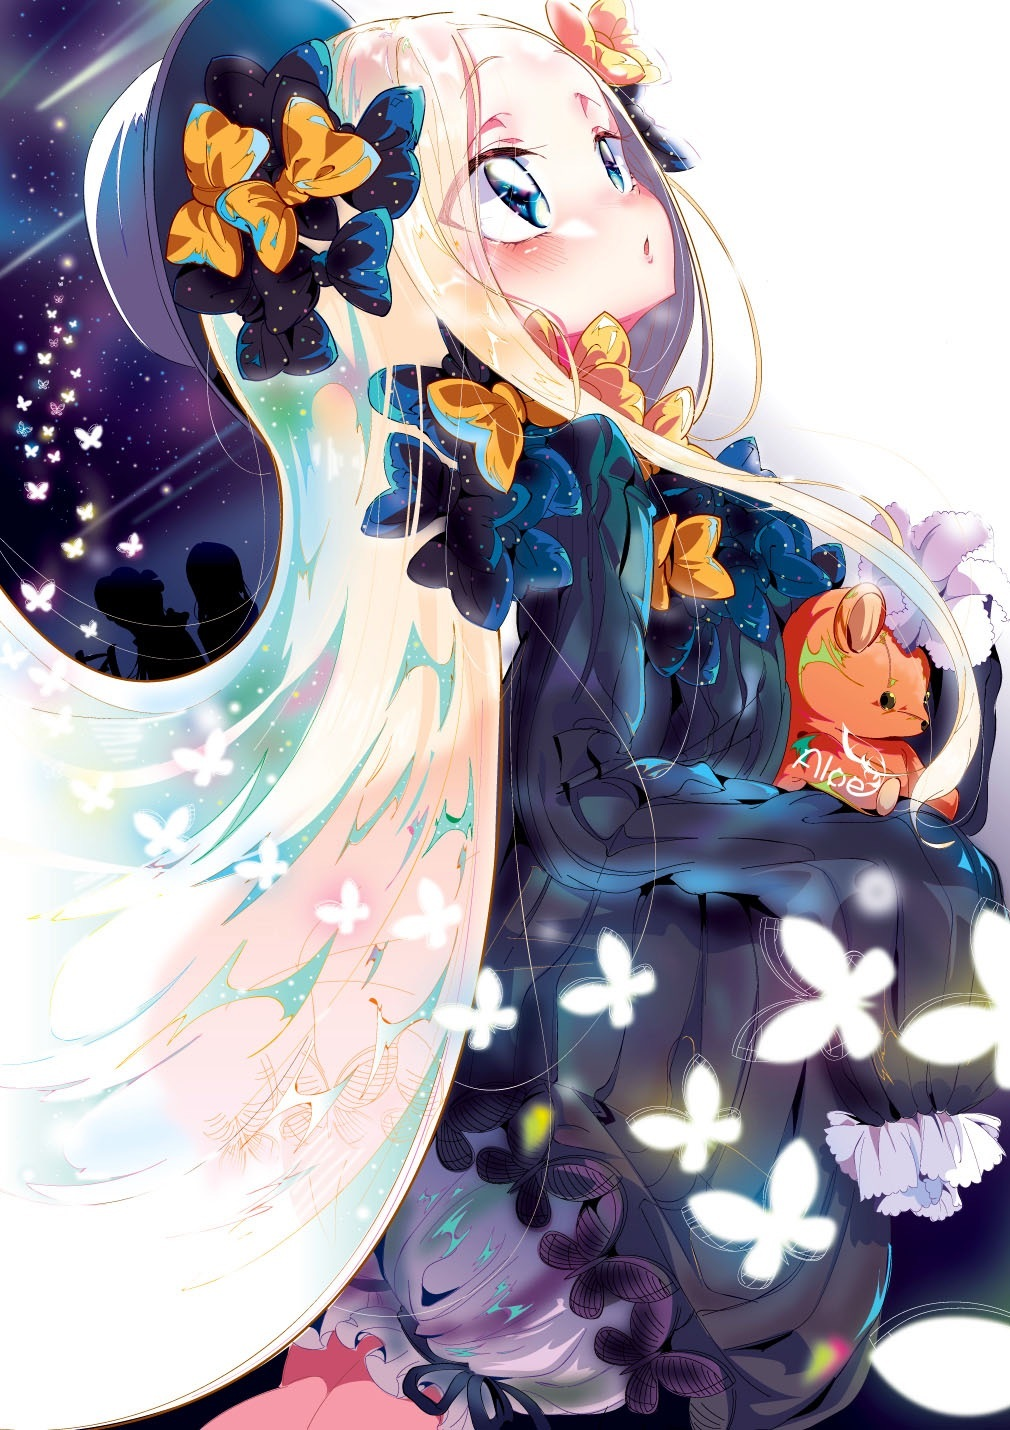 Fate/GrandOrder 異端なるセイレム アビゲイル・ウィリアムズ Abigail Williams No.5120